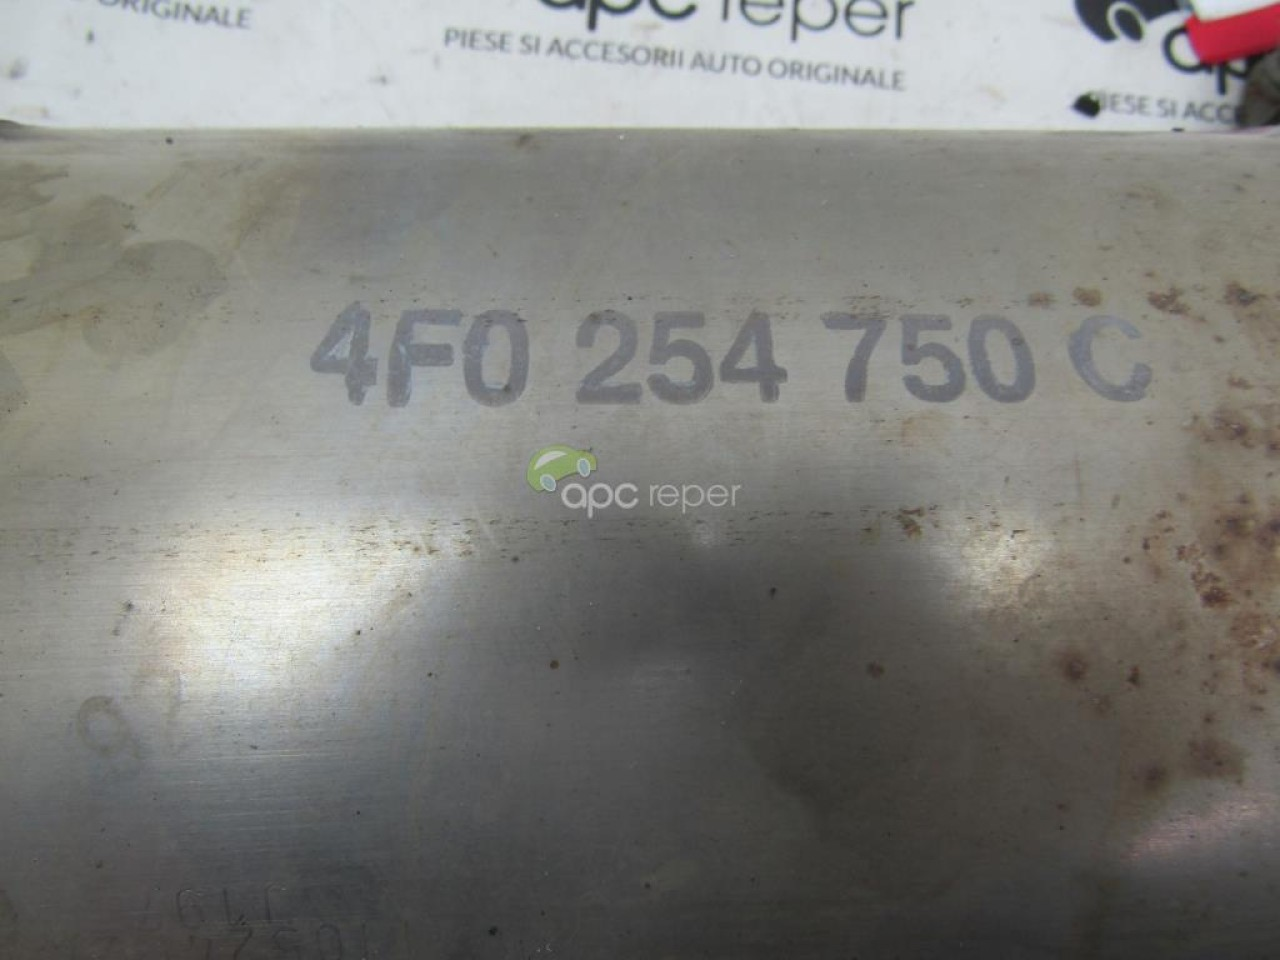 Filtru Particule - Dpf - Audi A6 4F Facelift 2,0Tdi - CAHA 4F0254750C - 8K0731703F